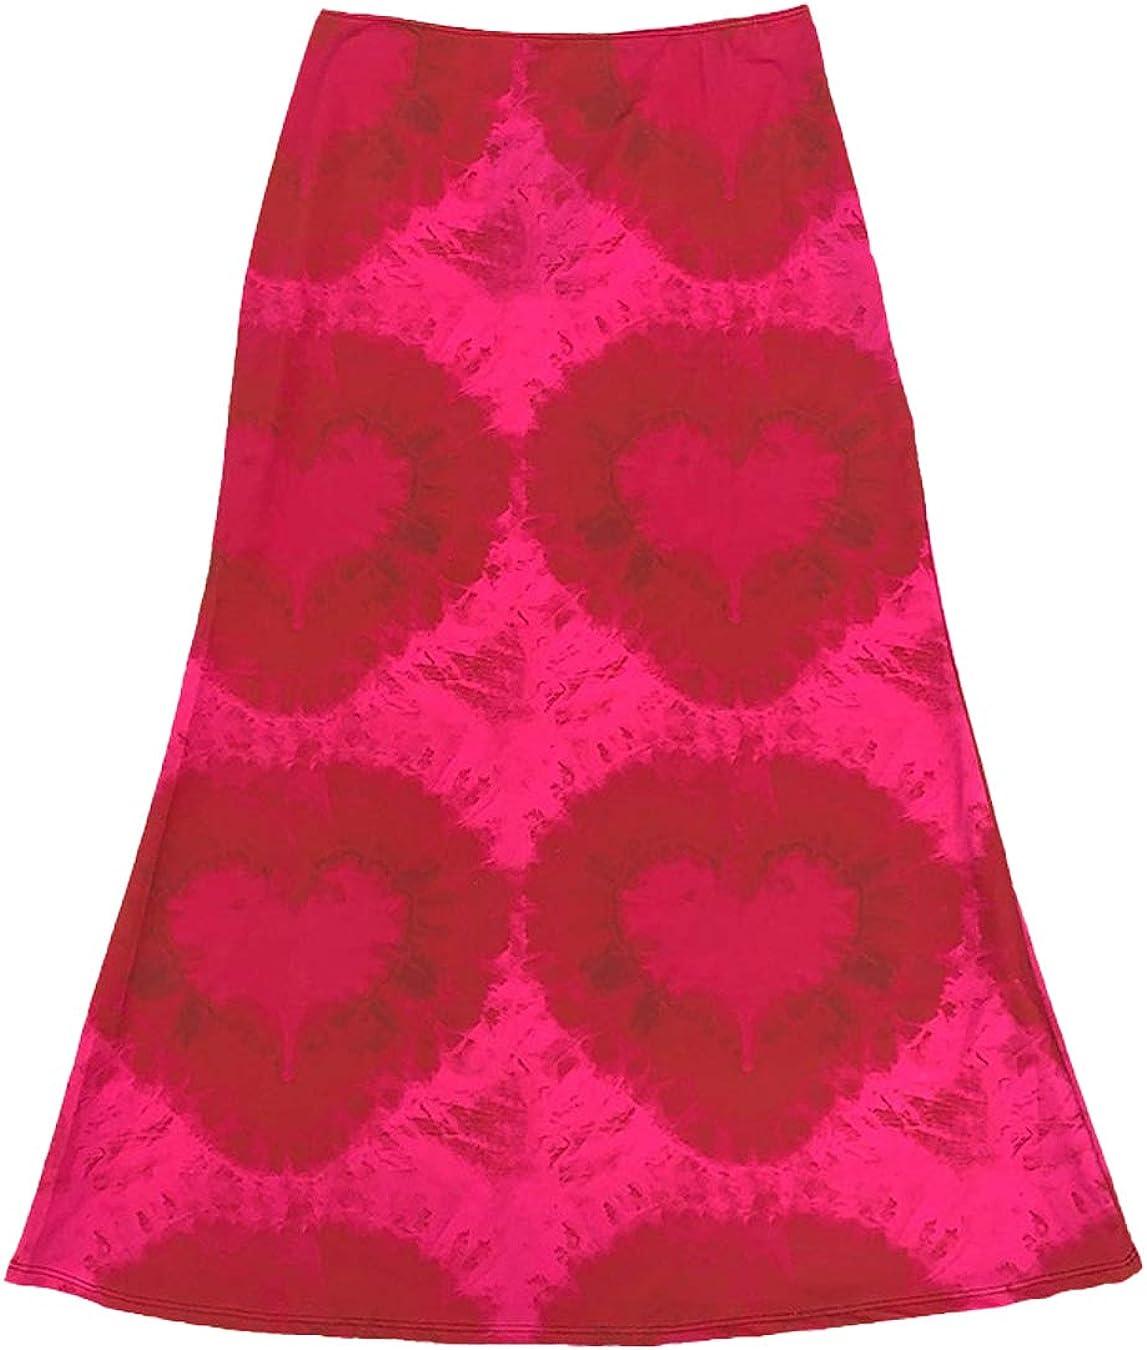 Women Casual Boho Skirts High Waisted Tie Dye Bodycon Skinny Aline Midi Party Skirt Red S